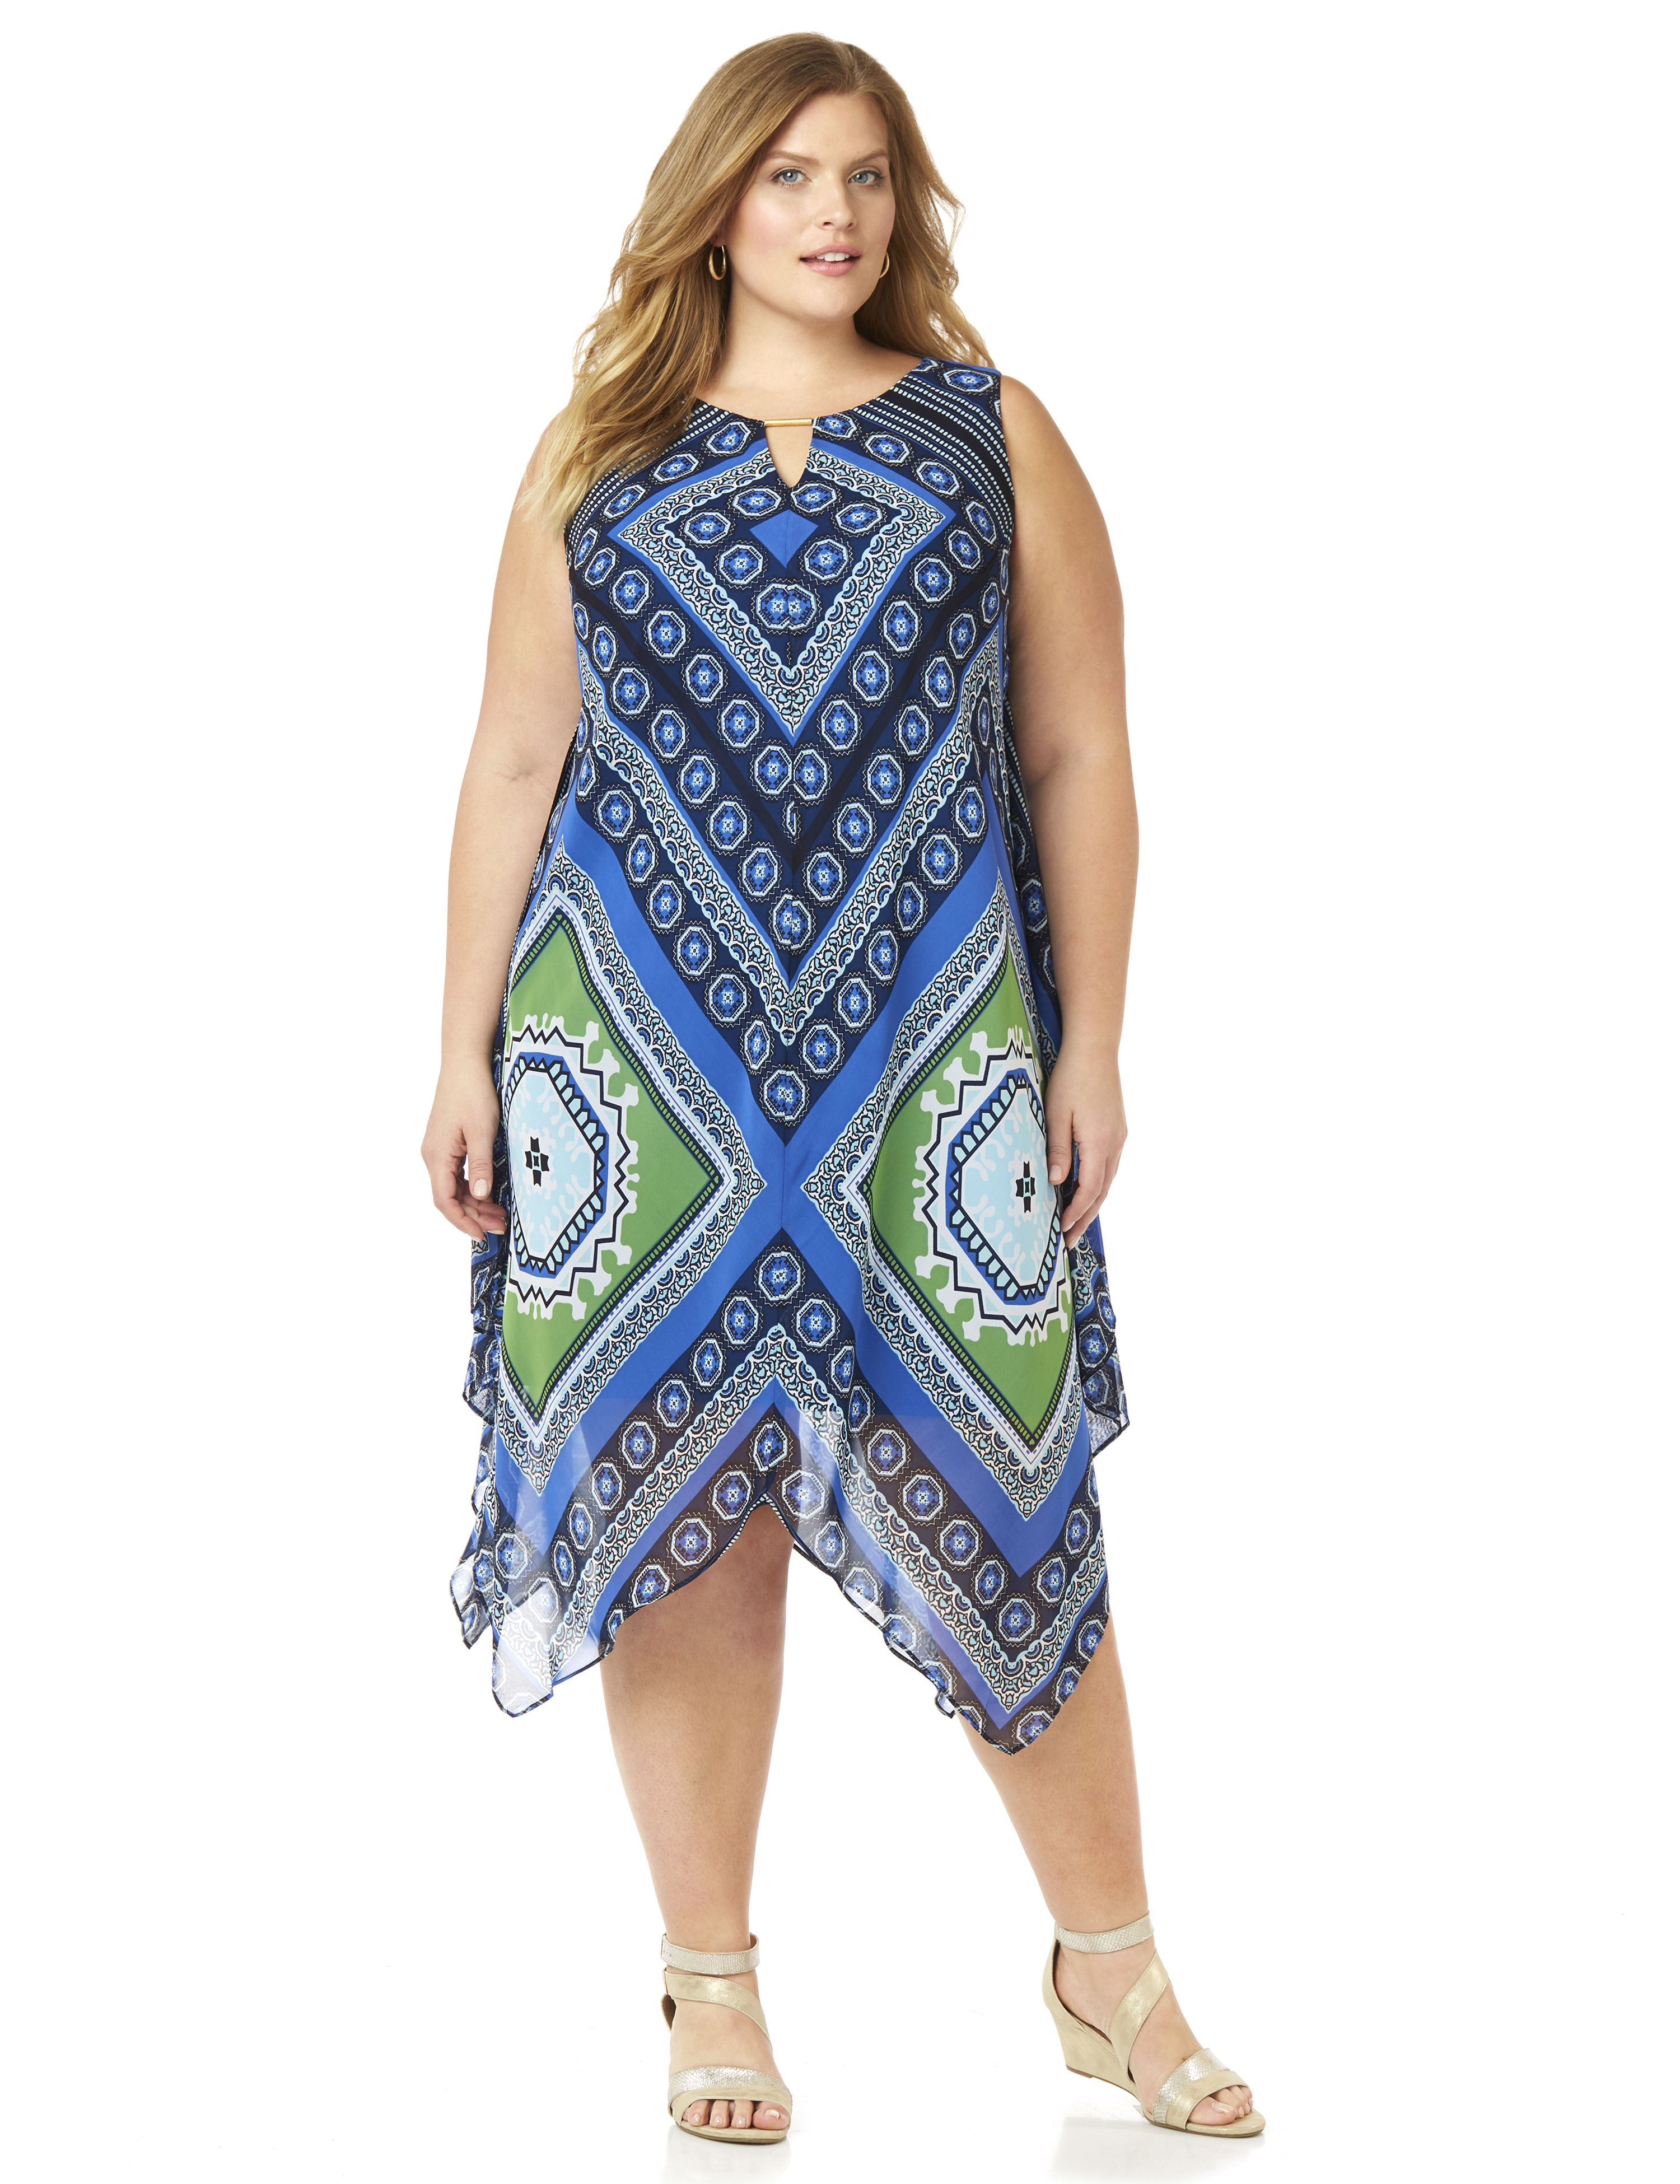 Plus size dress stores in houston tx